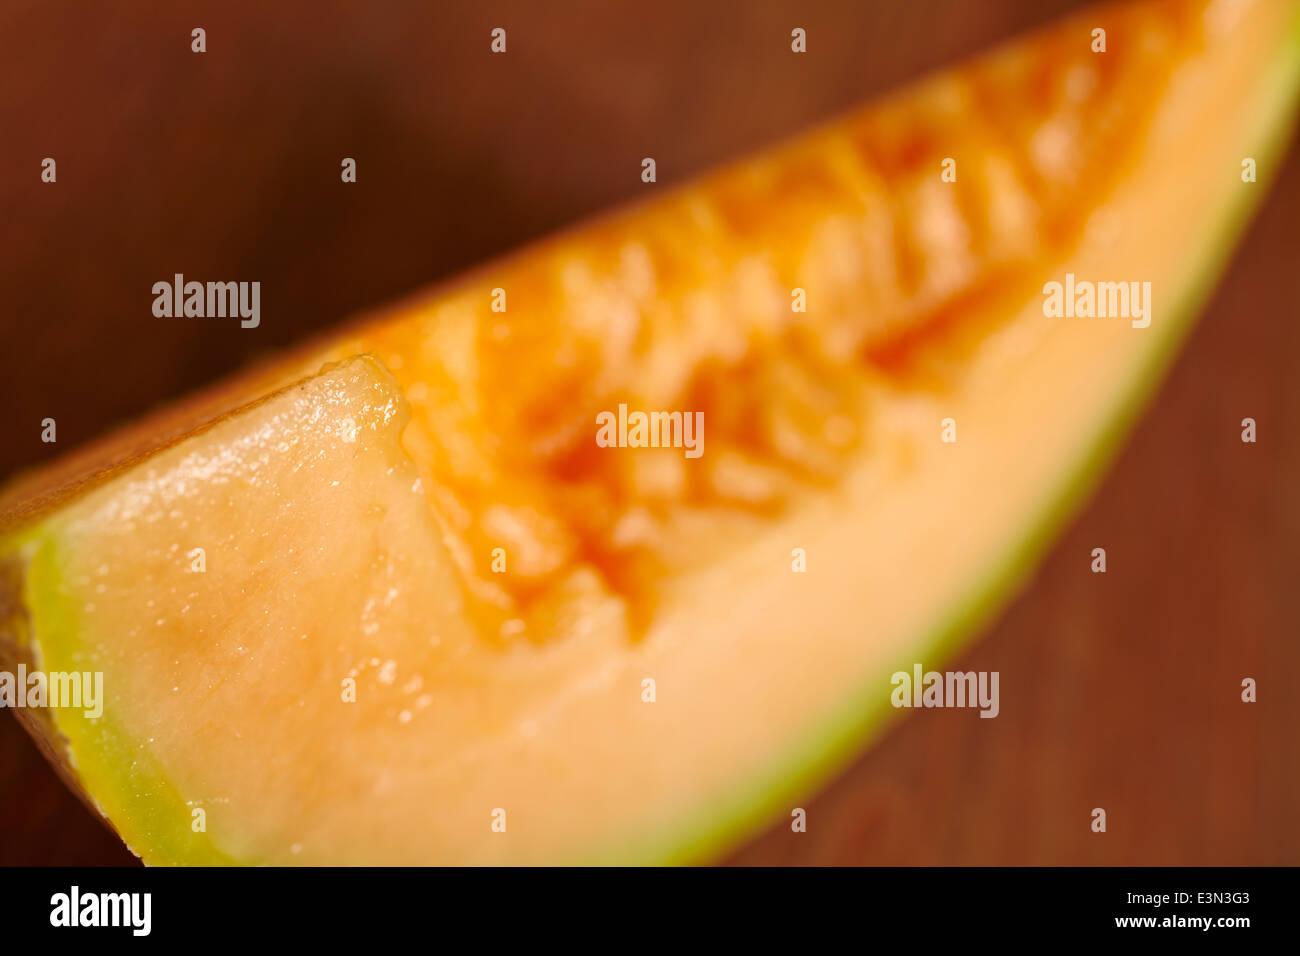 Rodaja de melón Imagen De Stock